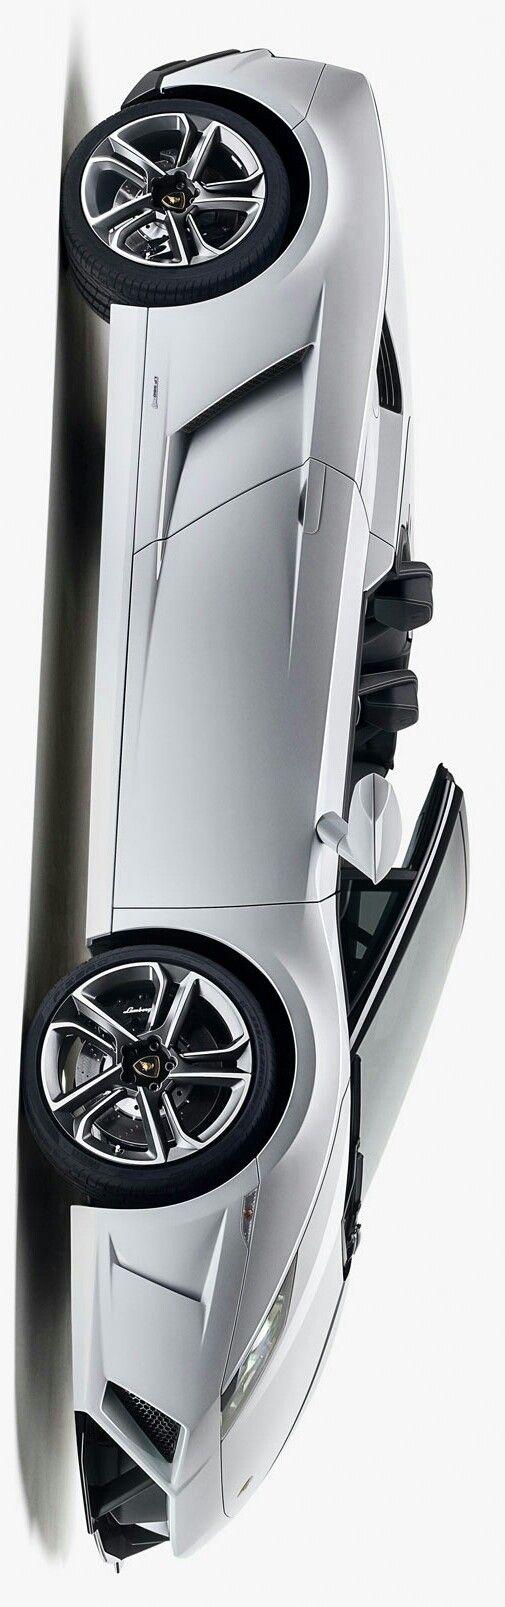 Lamborghini Gallardo LP 550-4 Spyder by Levon